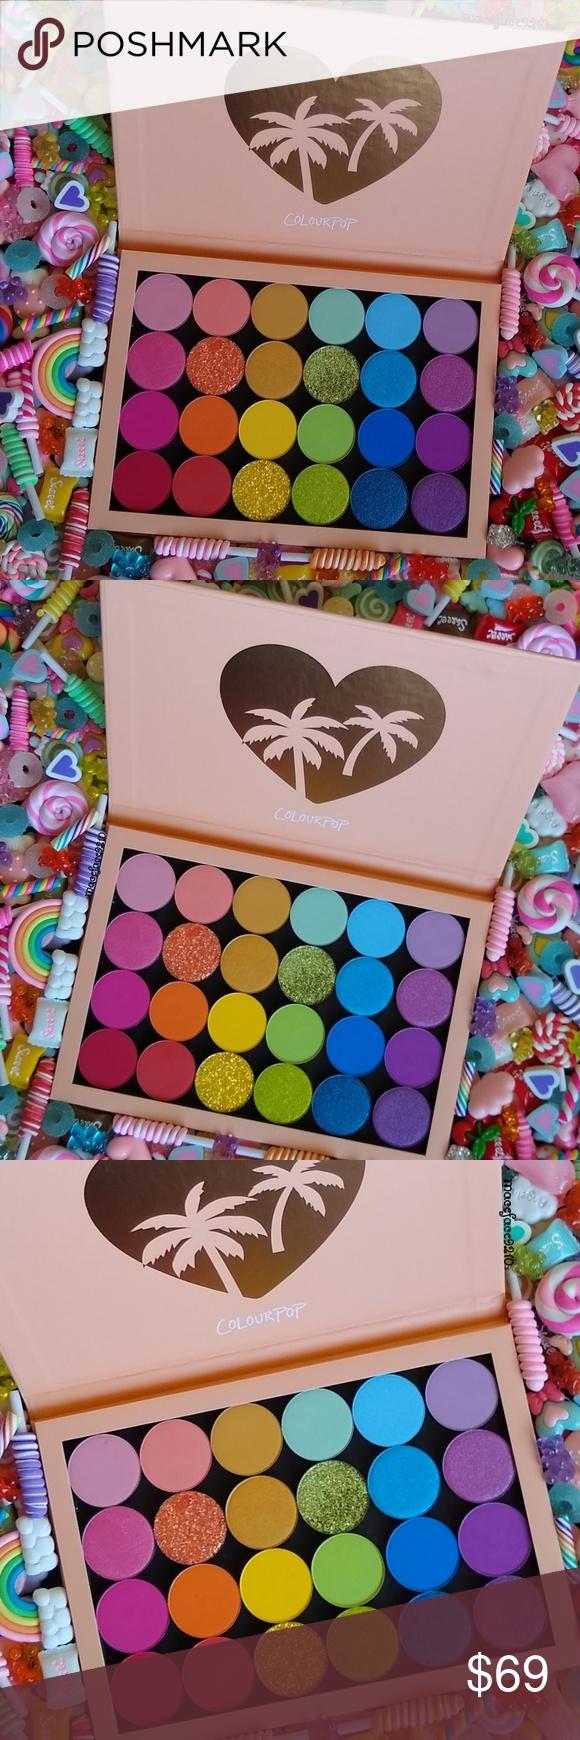 ColourPop Rainbow Pallete🌈 I swear colourpop made this